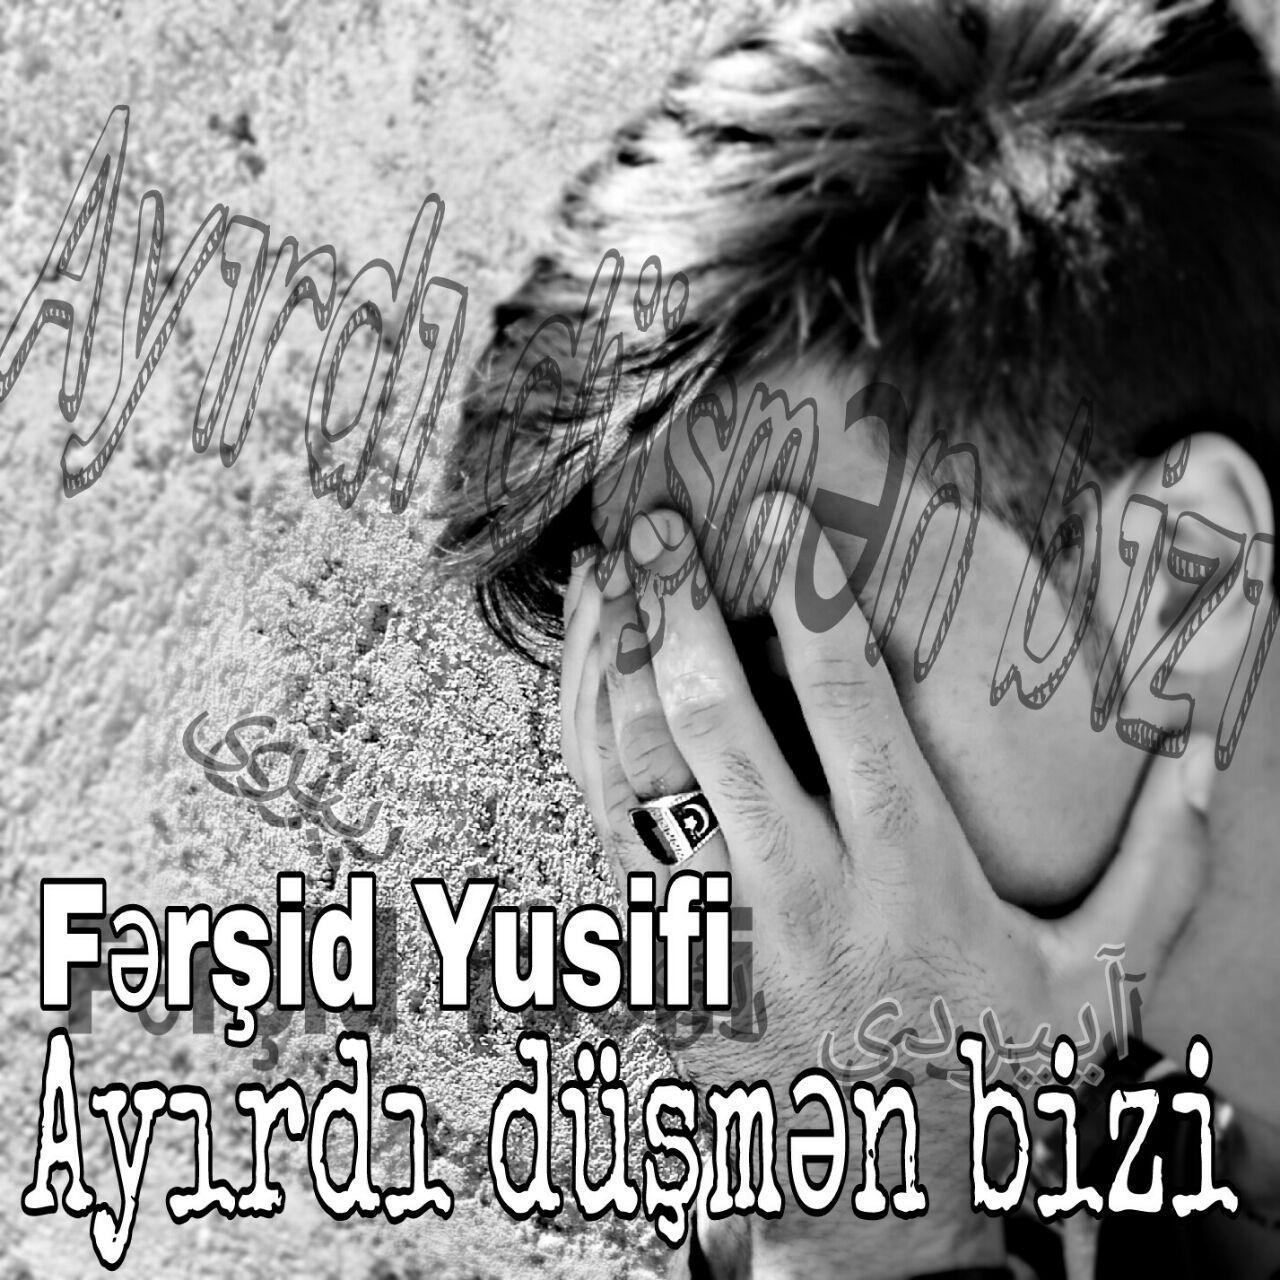 http://s8.picofile.com/file/8300684950/115Farshid_Yusifi_Ayiedi_Dusman_Bizi.jpg